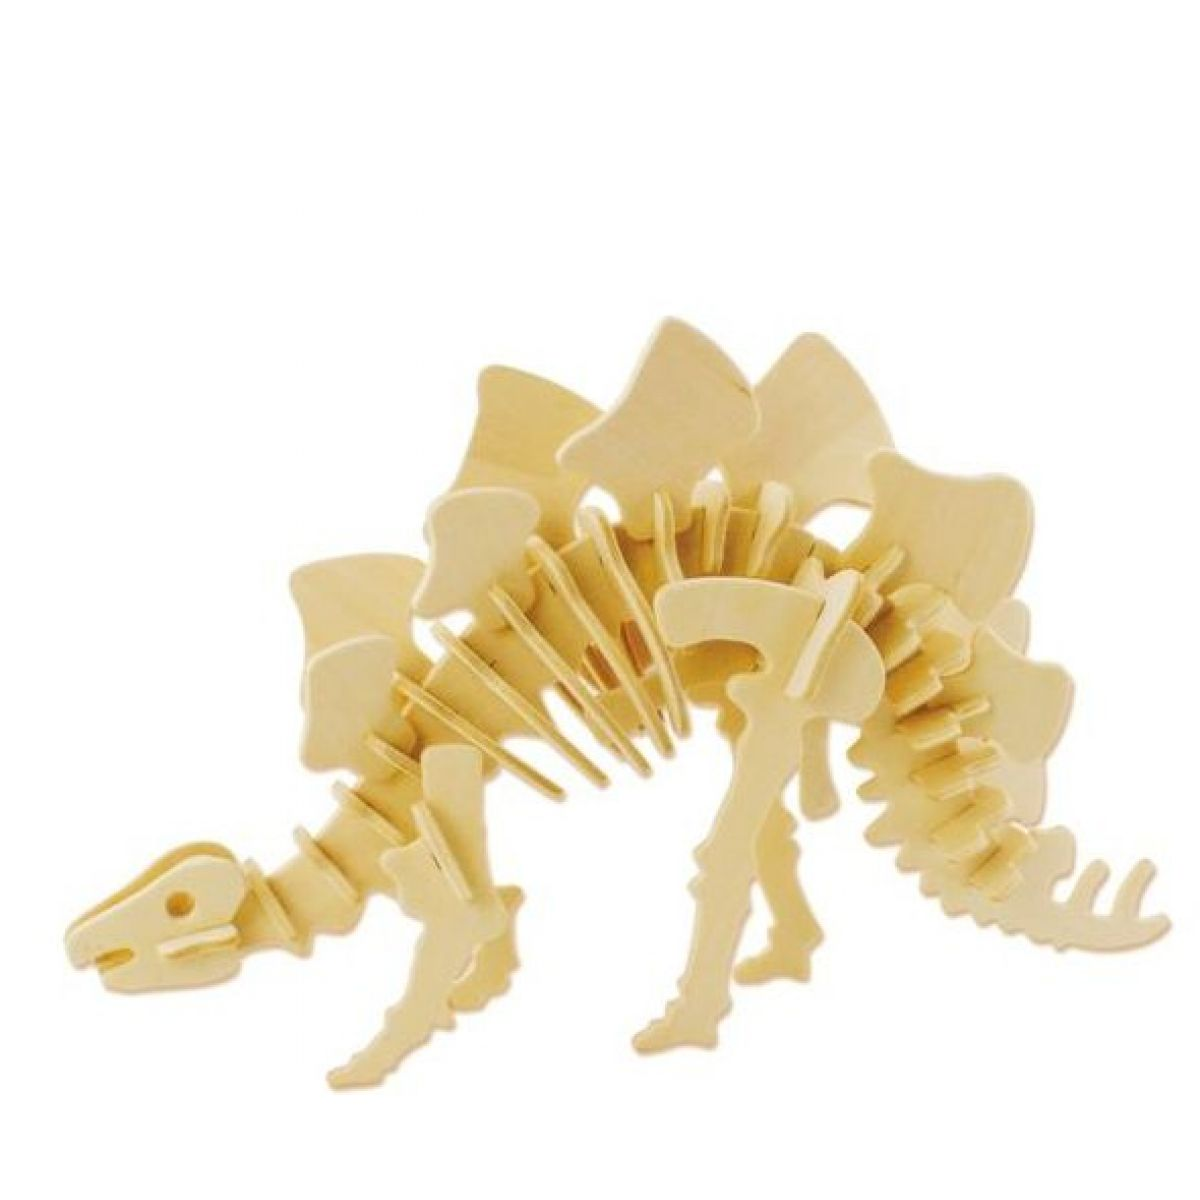 Eichhorn 3D puzzle kostra dinosaura Stegosaurus